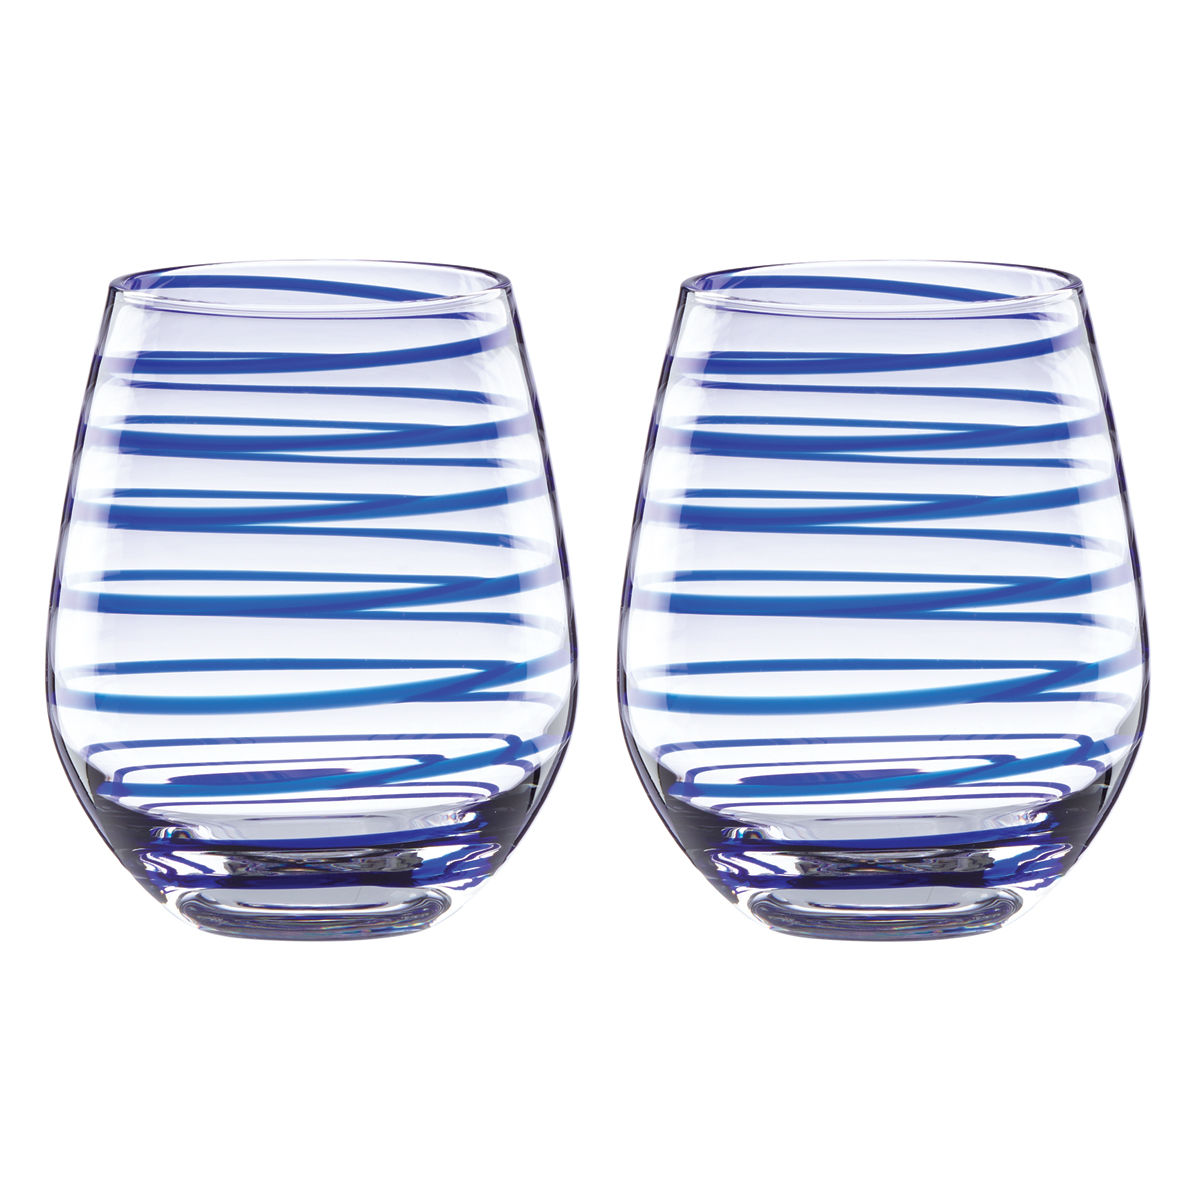 Kate Spade New York, Lenox Charlotte Street Stemless Crystal Wine, Pair